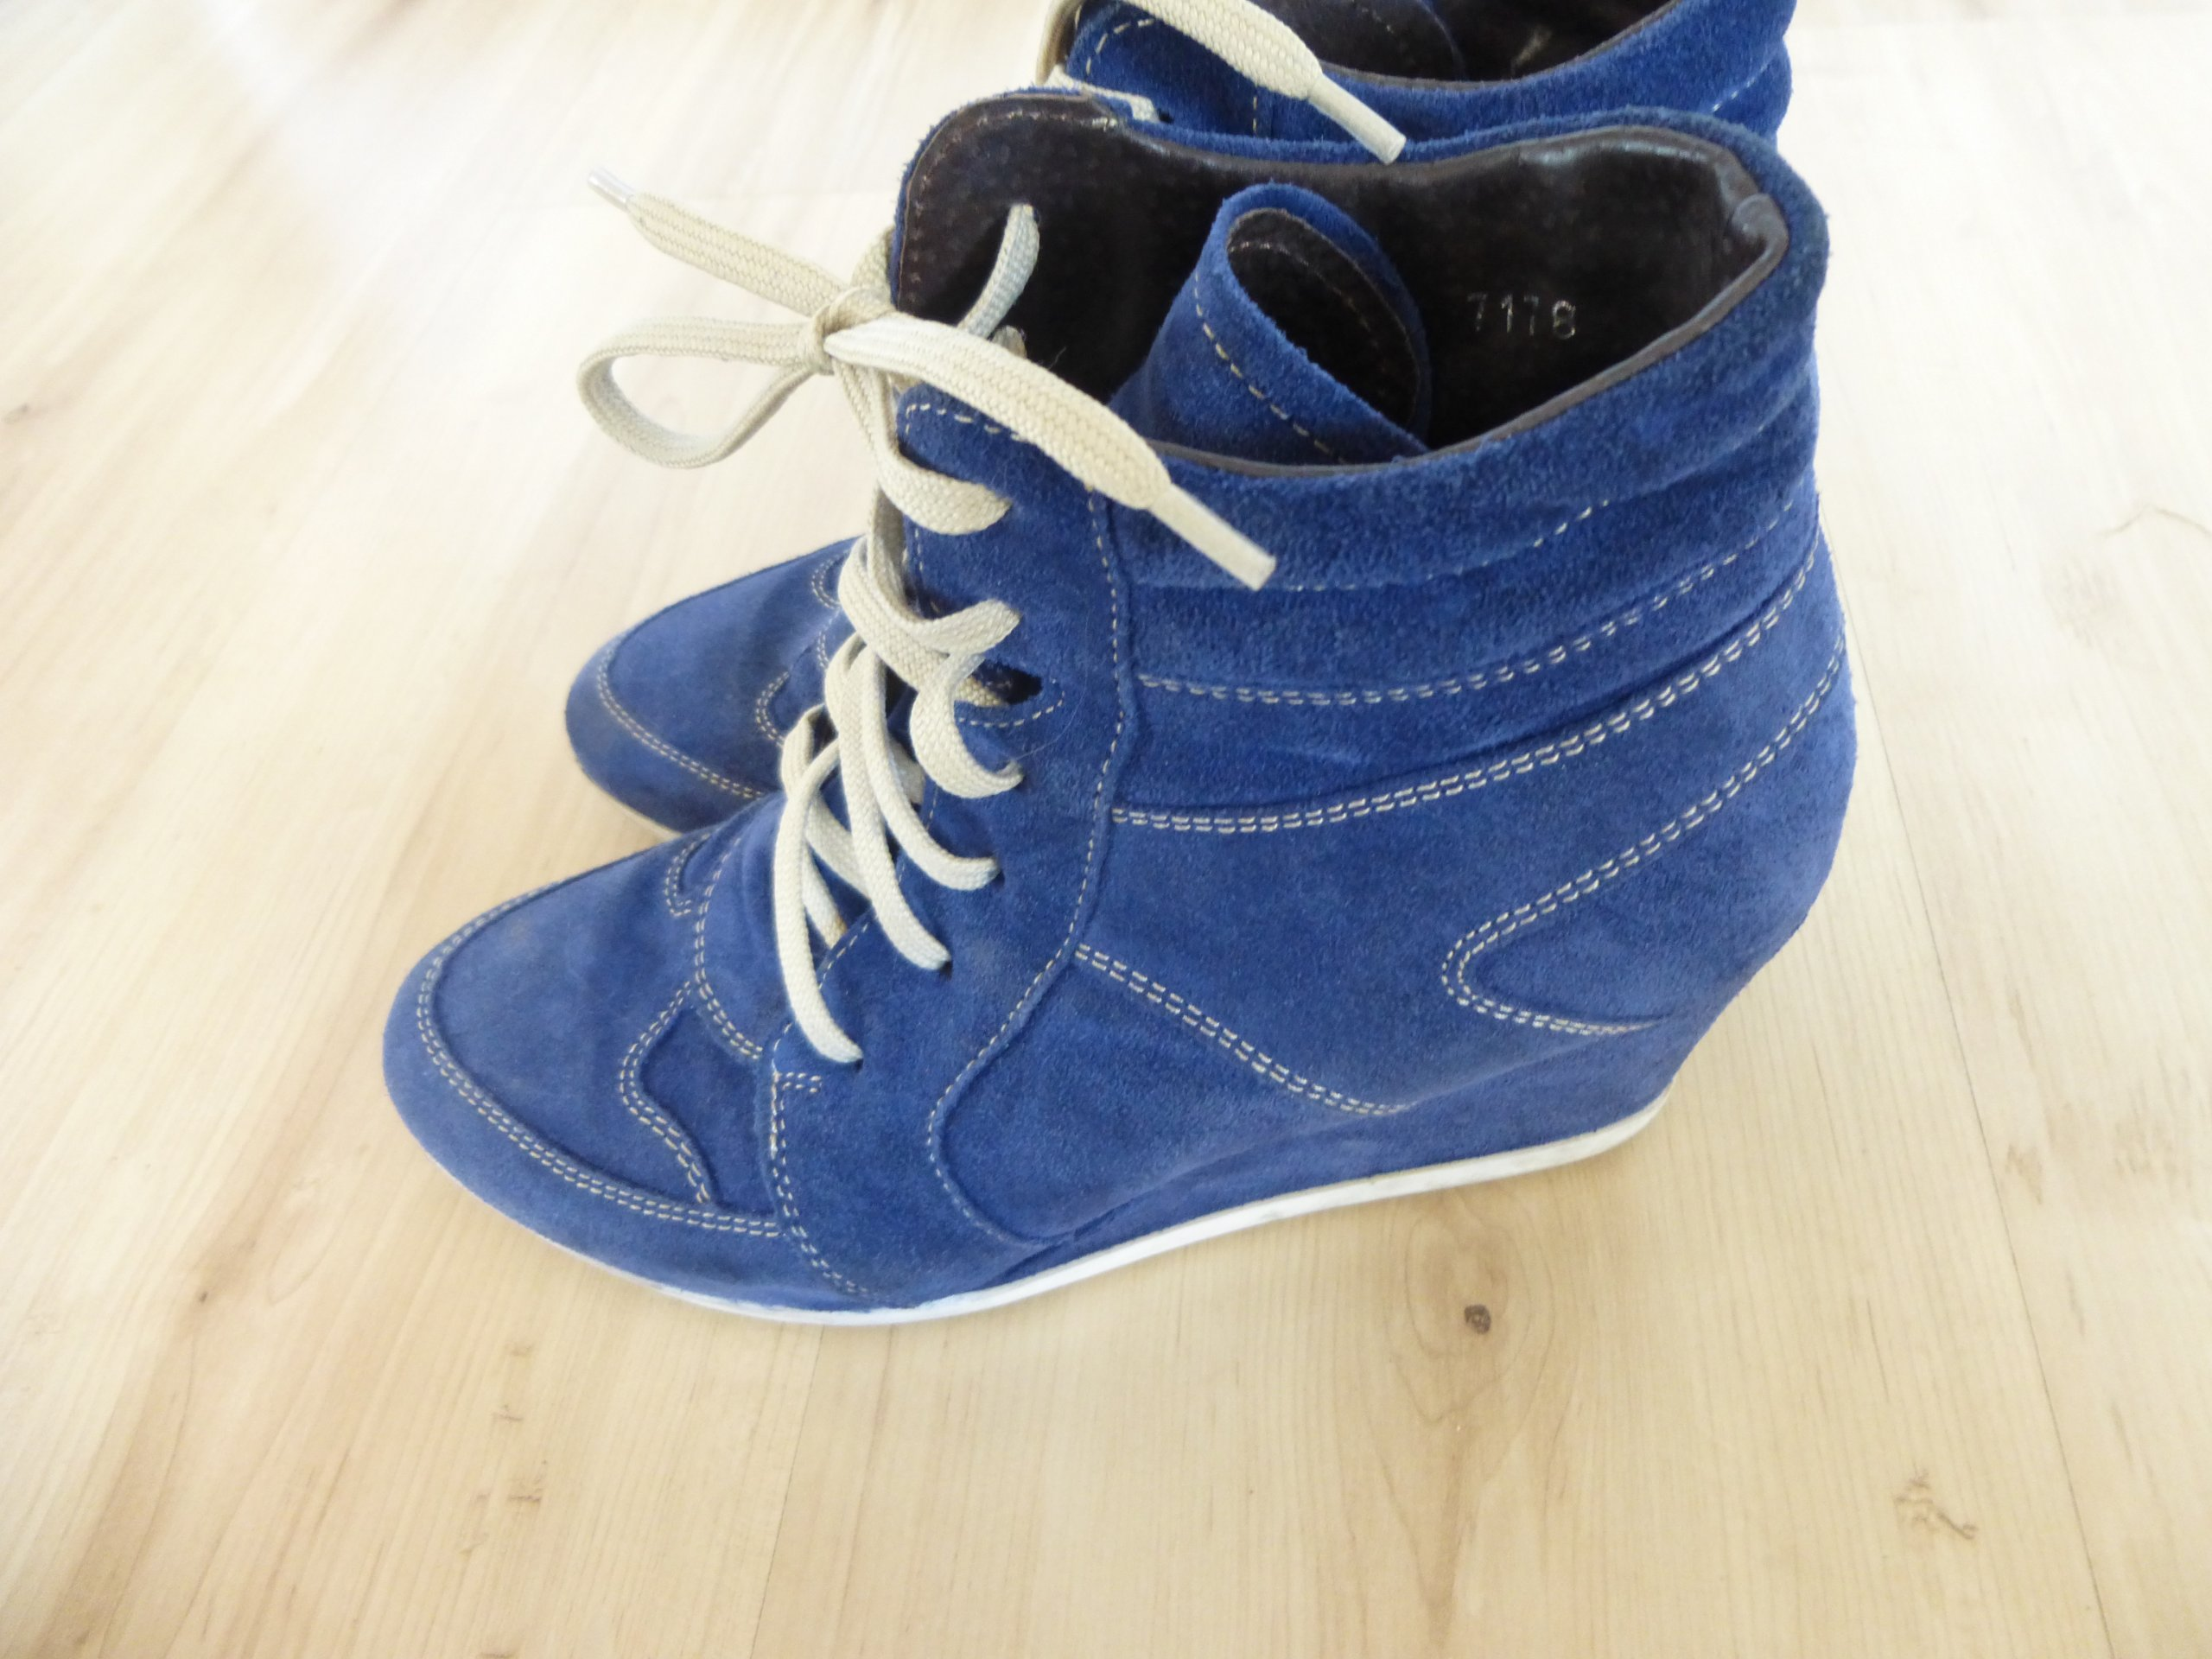 3a95272ef9bb4 Sneakersy koturn Wojas skóra zamsz 37 super ideal - 7280743402 ...